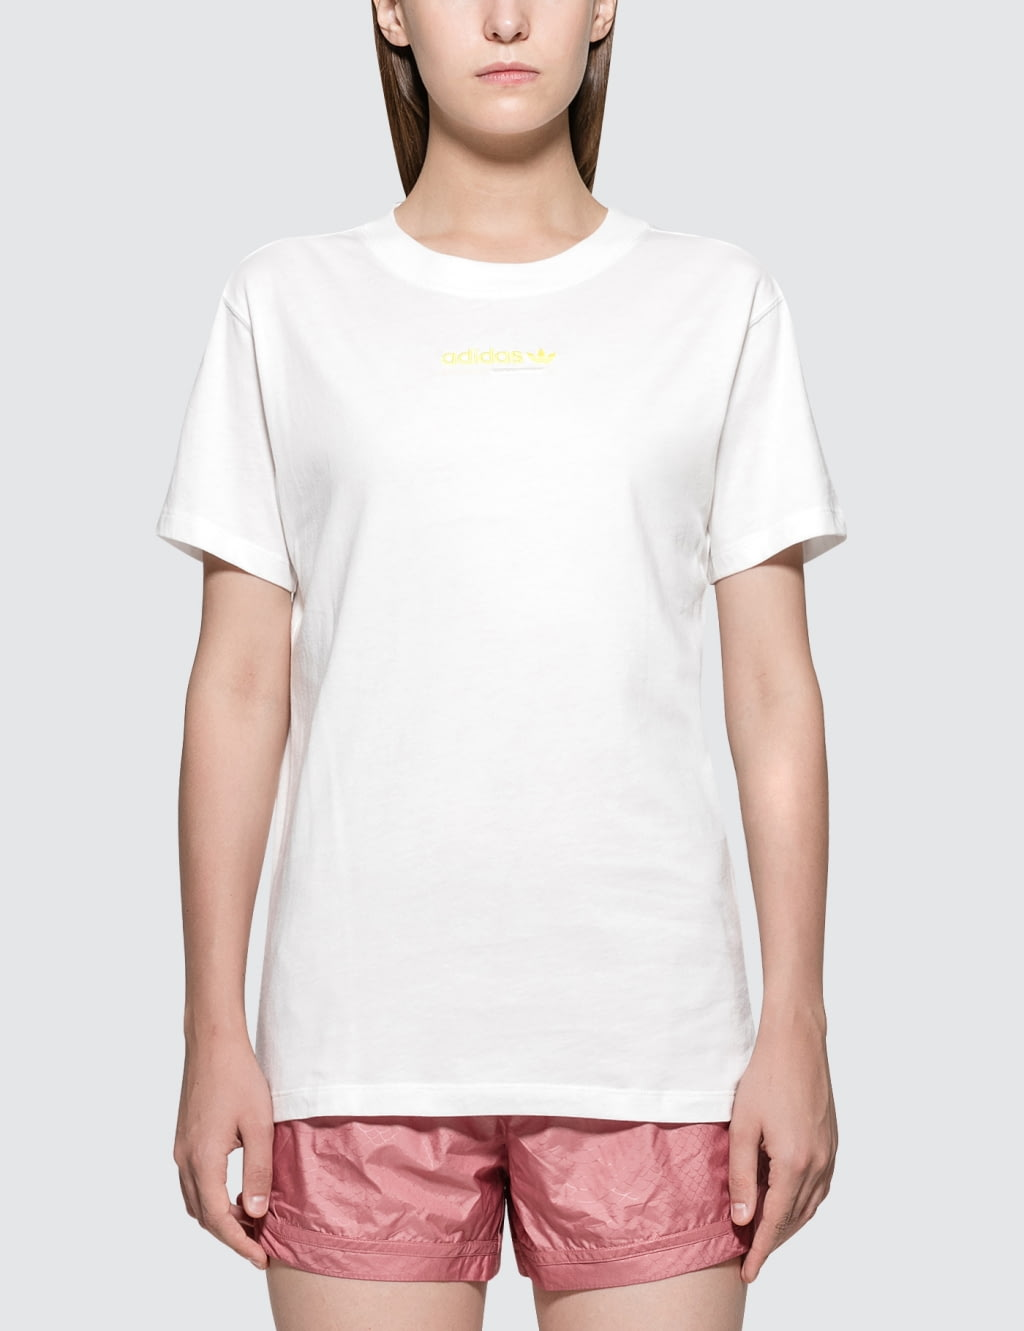 Comprare originali adidas originali t - shirt ss in indonesia bobobobo